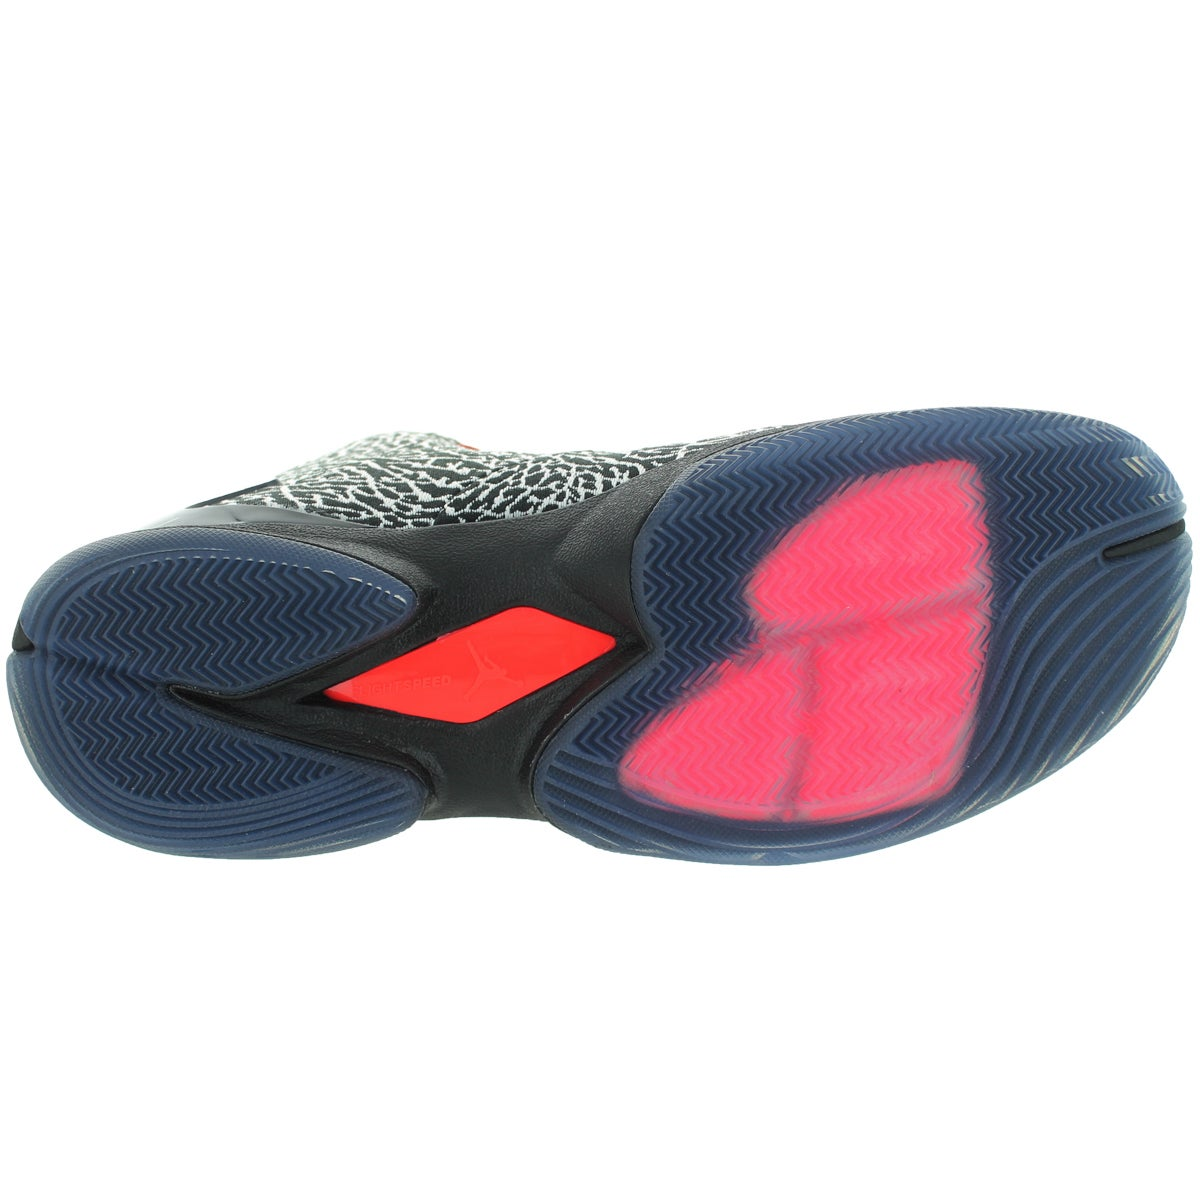 check out 36c14 dec35 Shop Nike Jordan Men s Jordan Super.Fly 4 Jcrd White Gym Red Black  Basketball  Shoe - Free Shipping Today - Overstock - 12318252